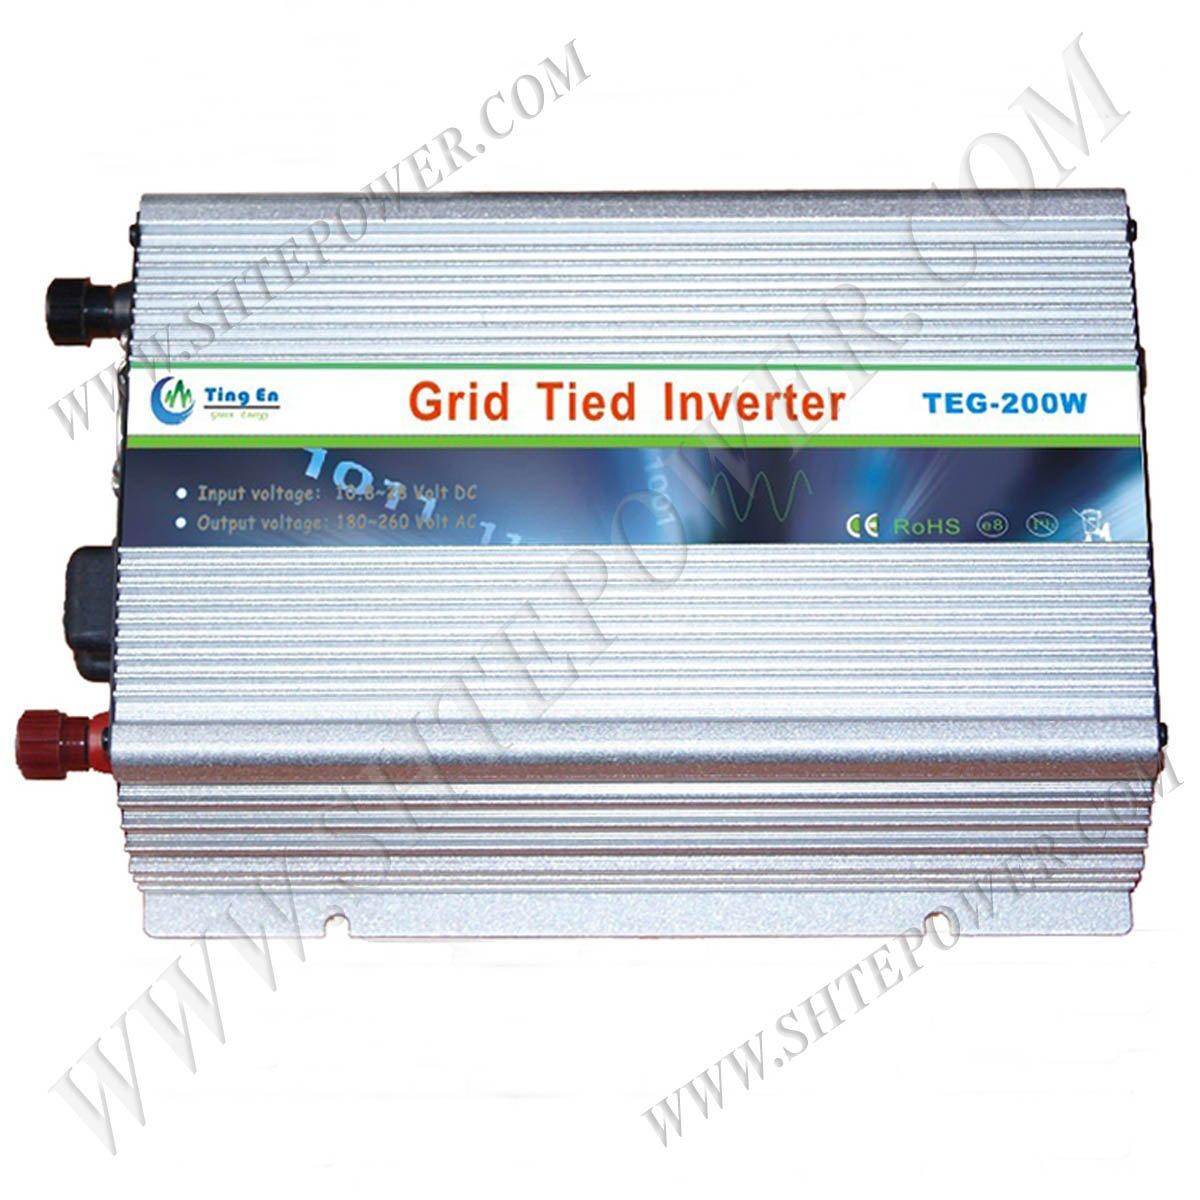 200W Grid Tie Inverter, MPPT Function, Solar On Grid Inverter 200w(China (Mainland))